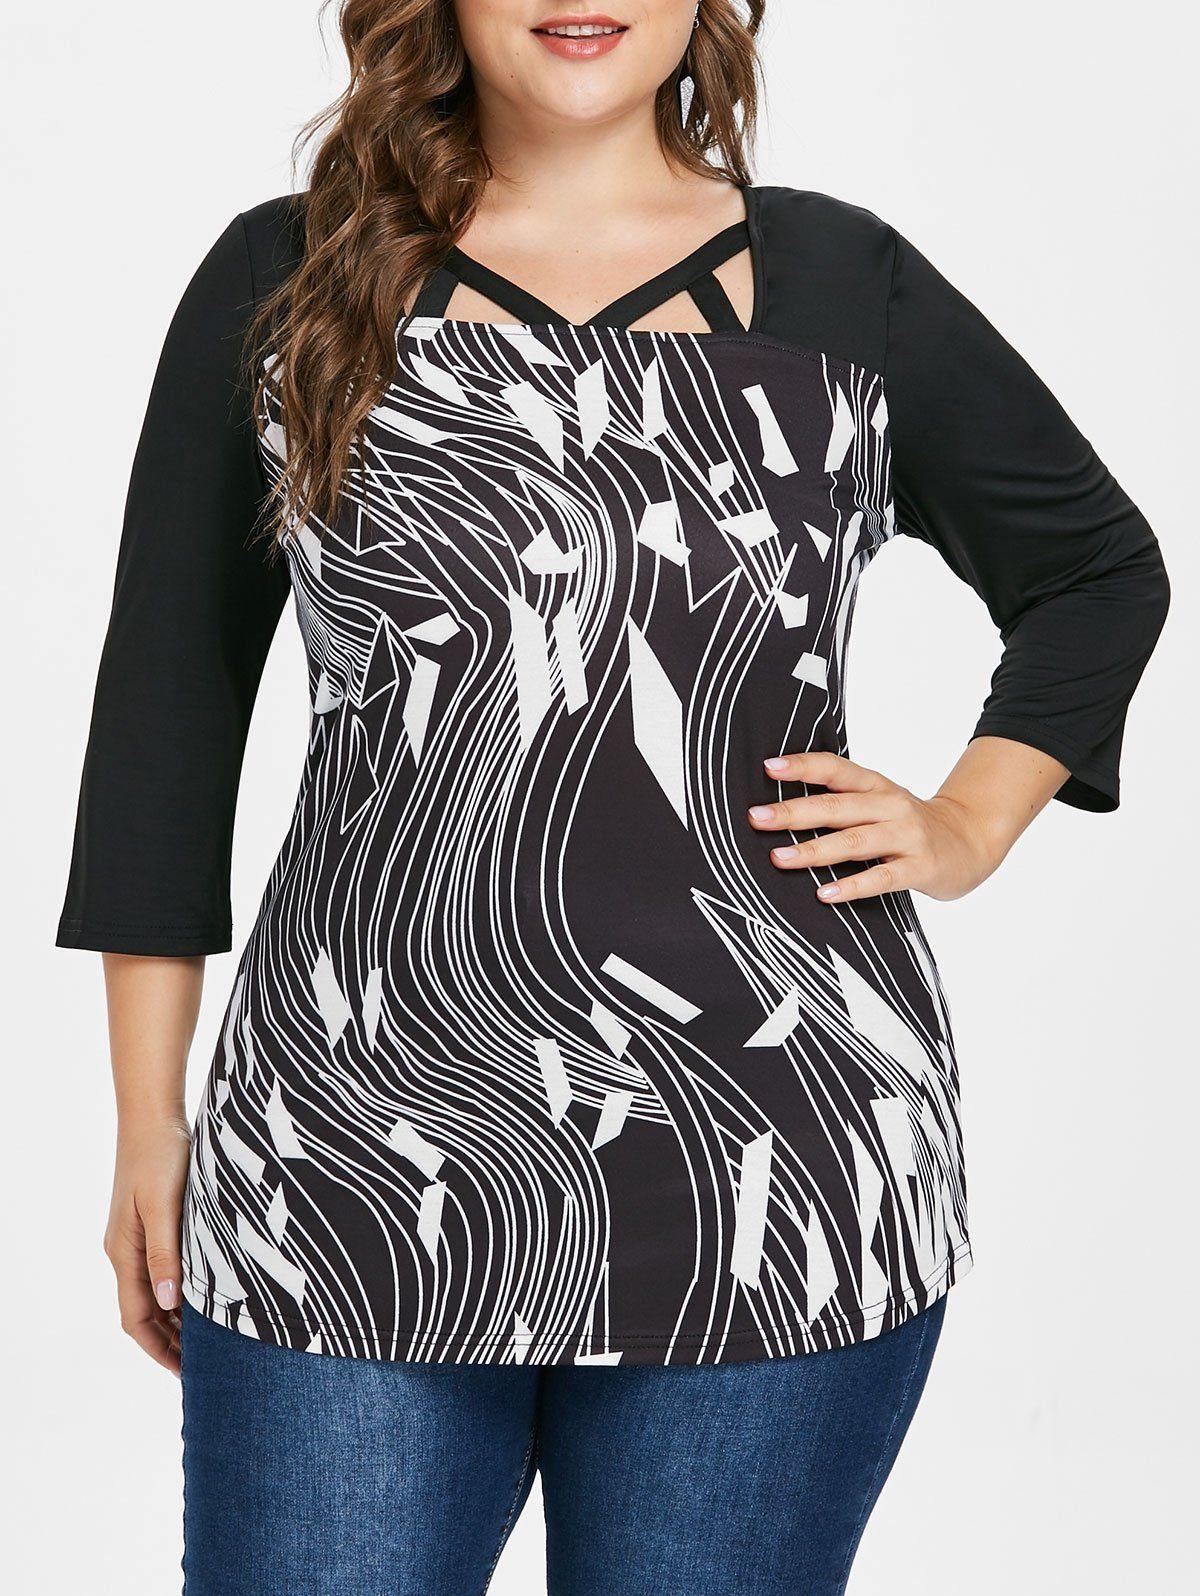 Plus Size Graphic Square Neck T-shirt | pretties in 2019 ...